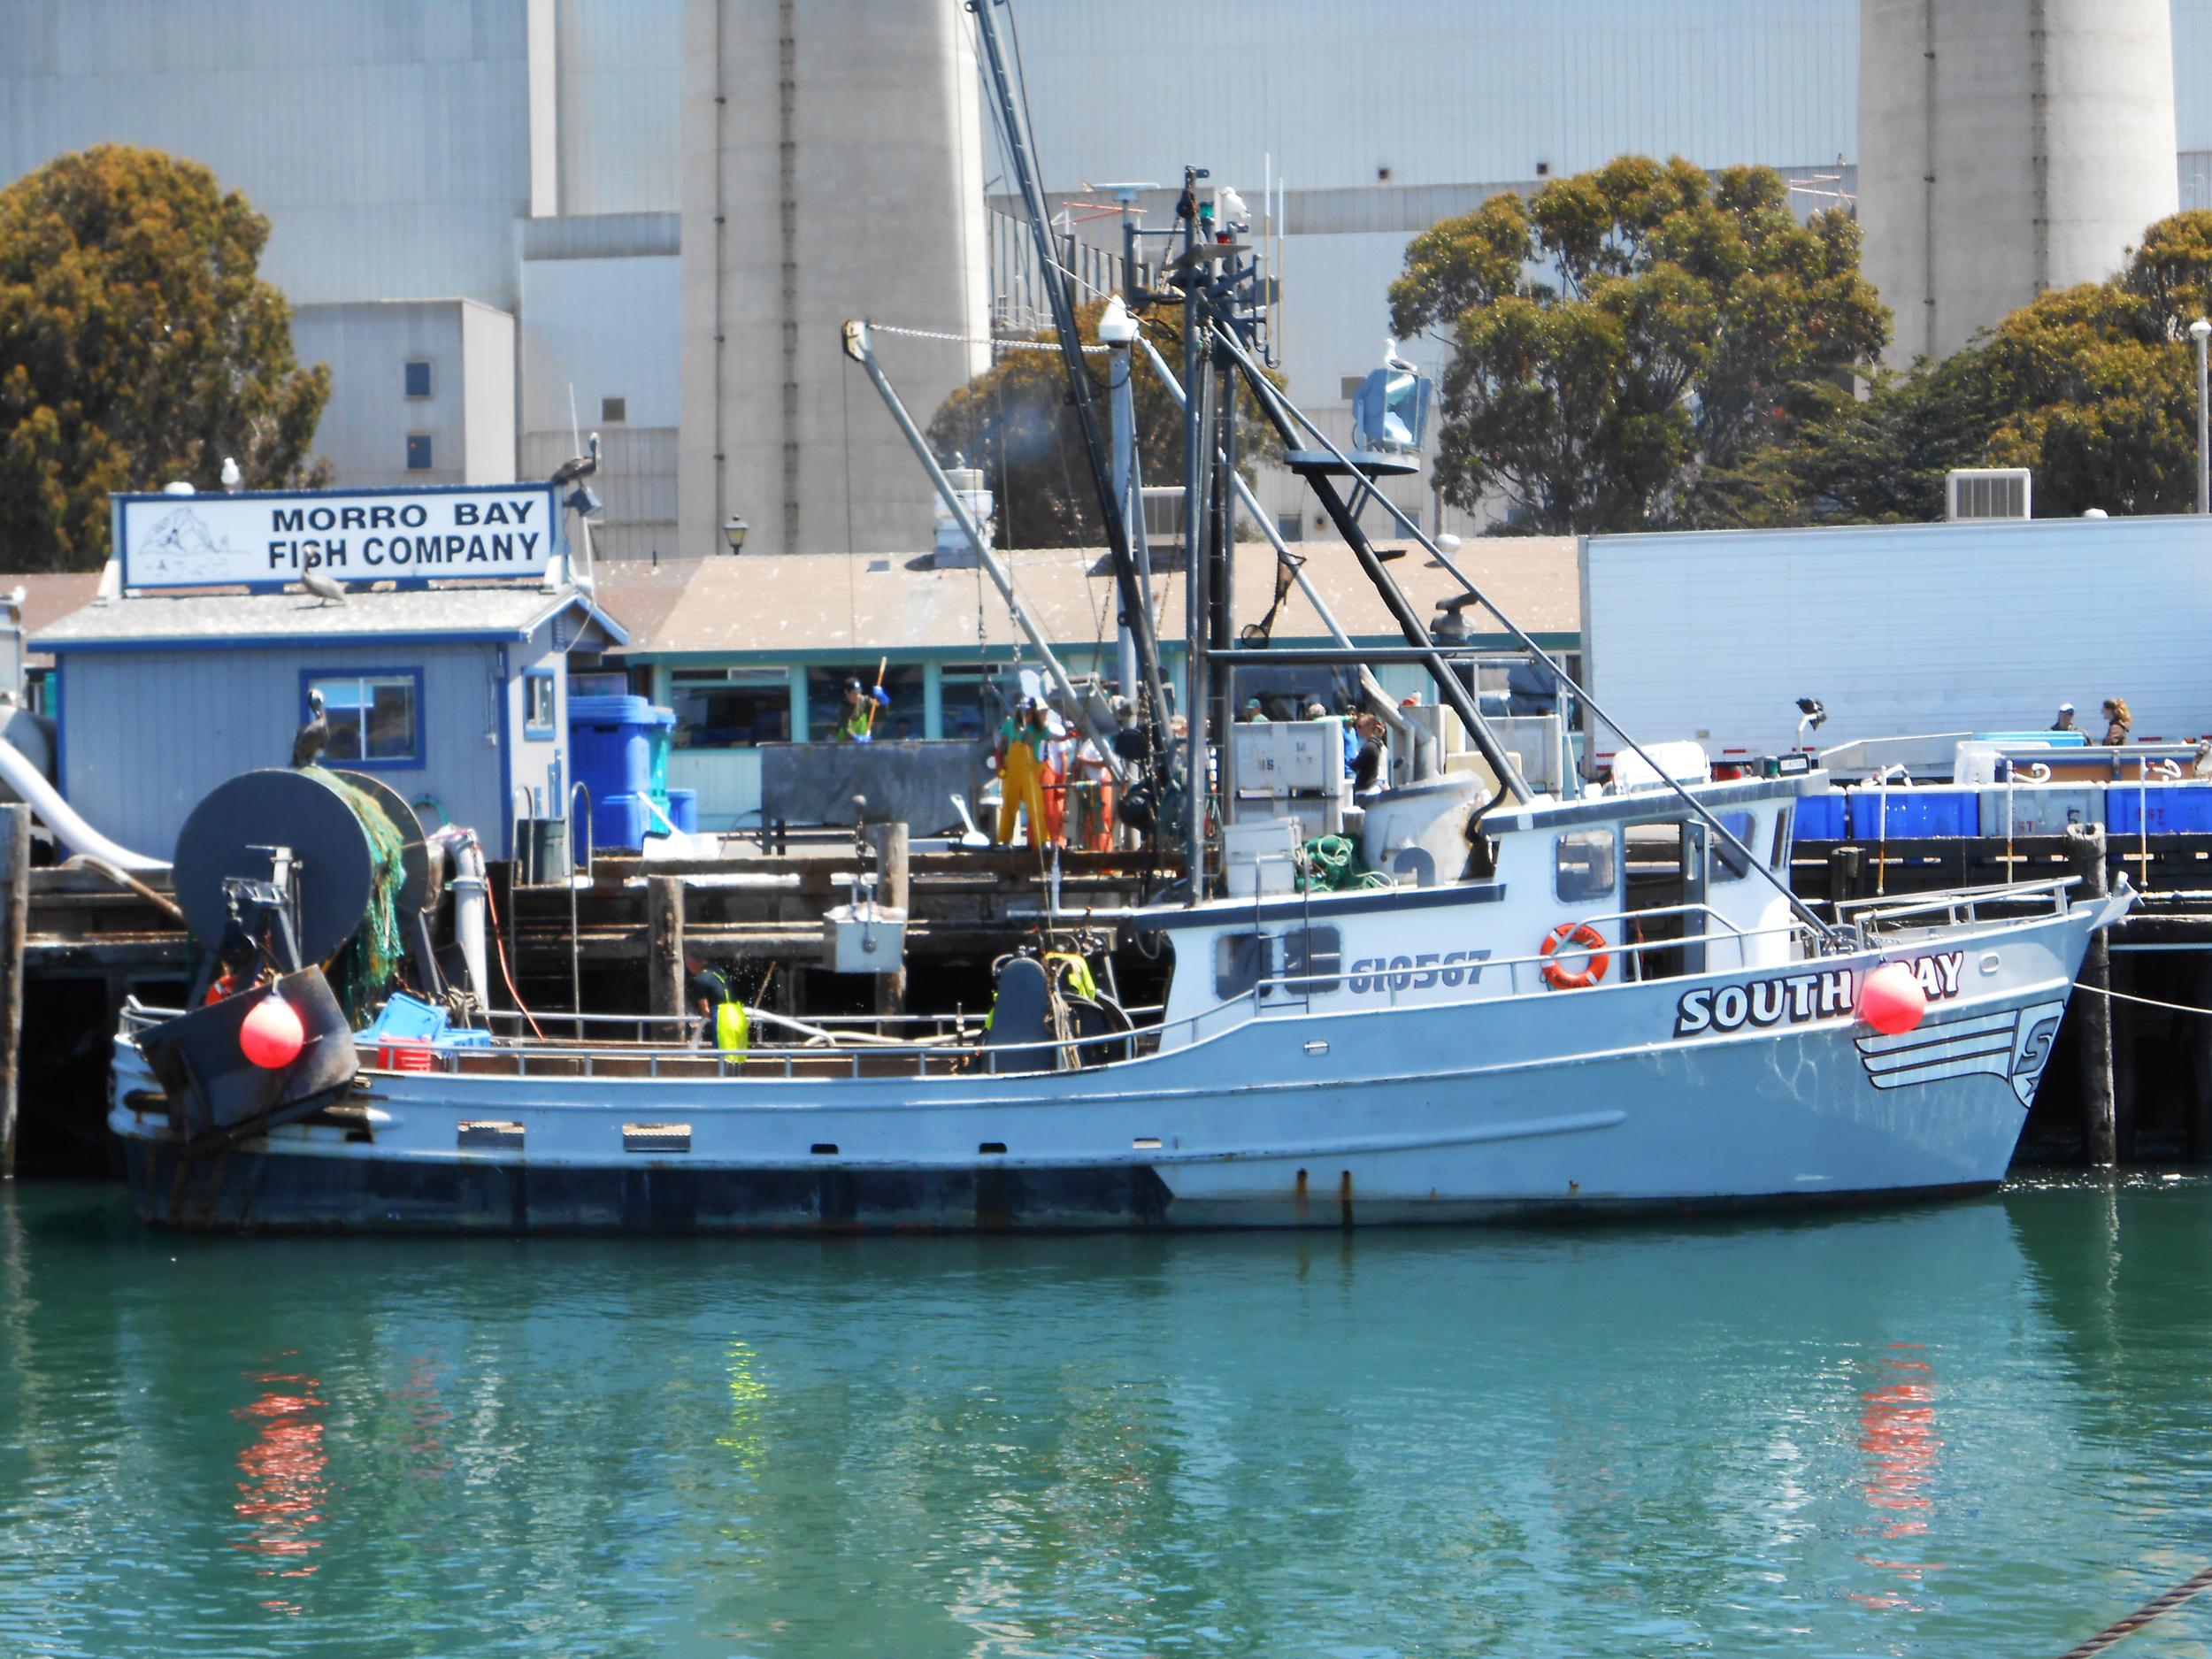 South Bay Fishing Vessel